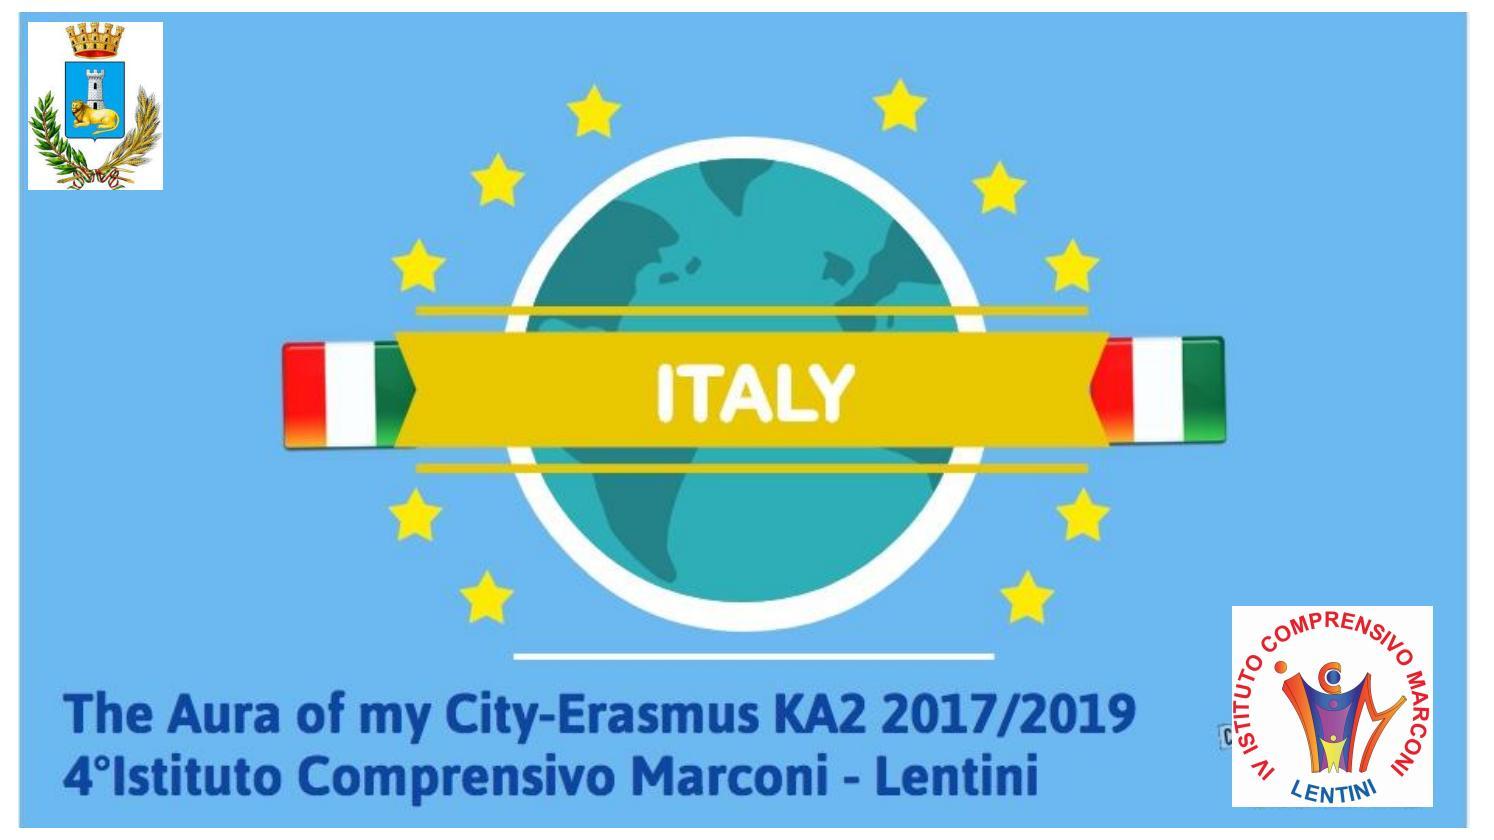 Liceo Artistico Michelangelo Como tamc - italy by the aura of my city erasmusplus - issuu